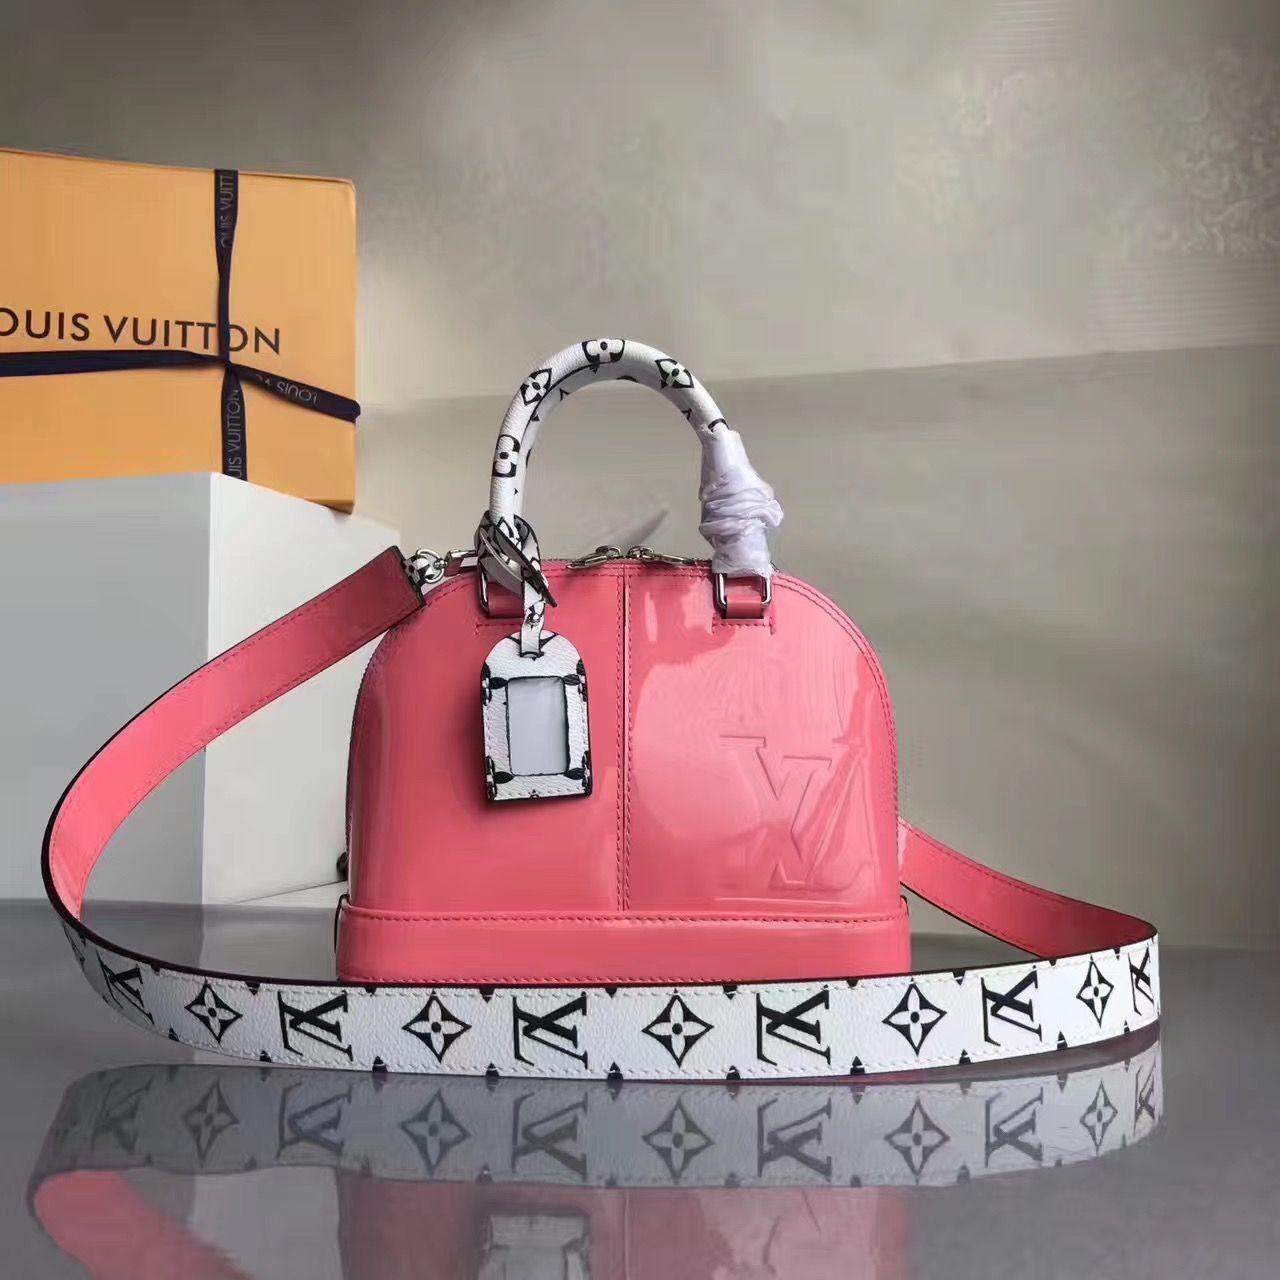 Louis Vuitton Alma BB Vernis Lisse Handbag Hot Pink 2017  429f21c37d9c6